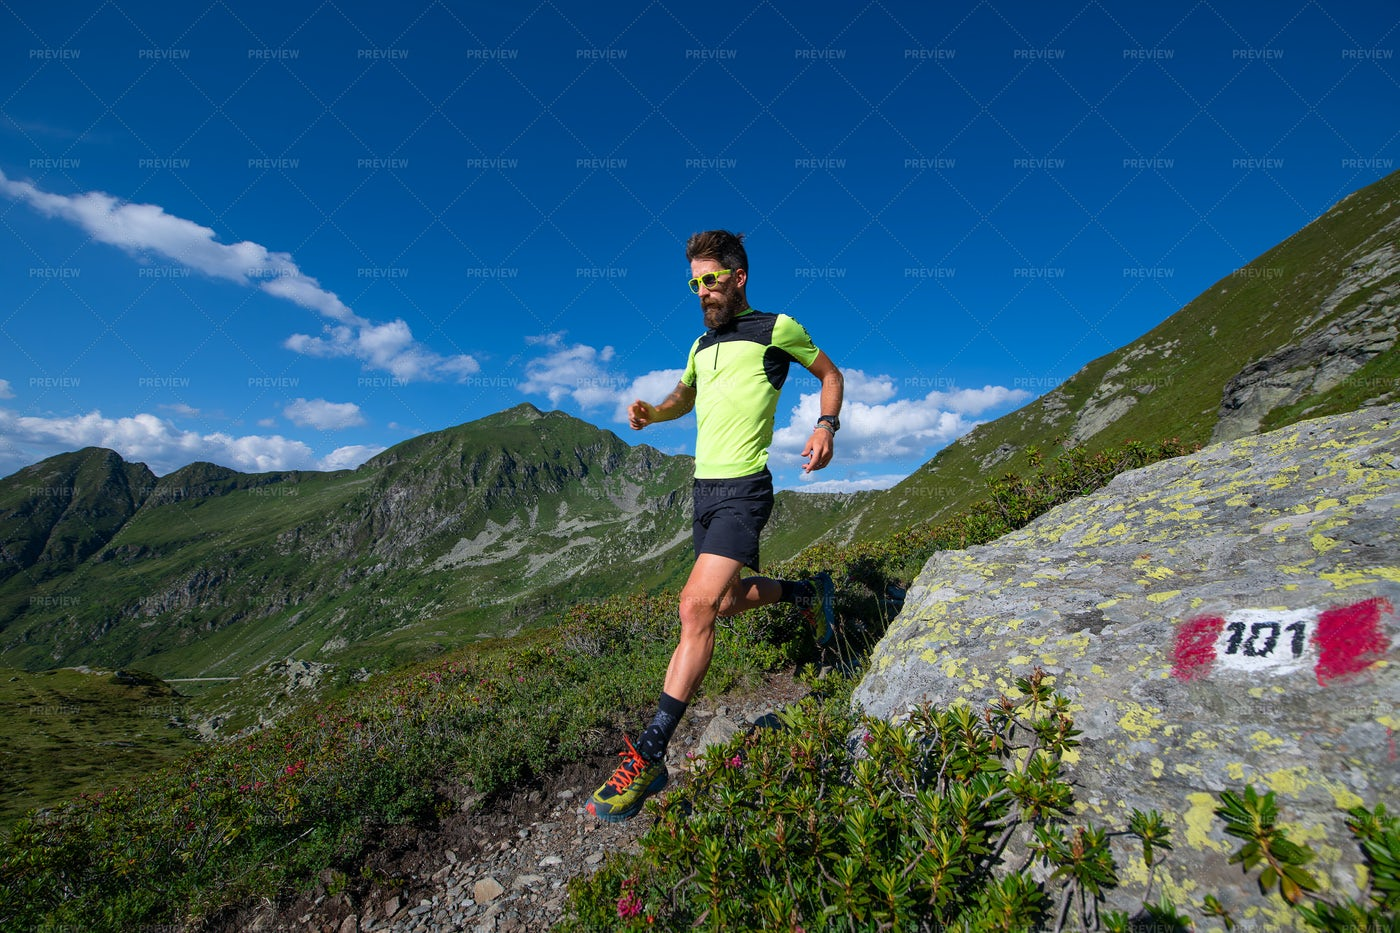 Athlete Running In Mountains: Stock Photos